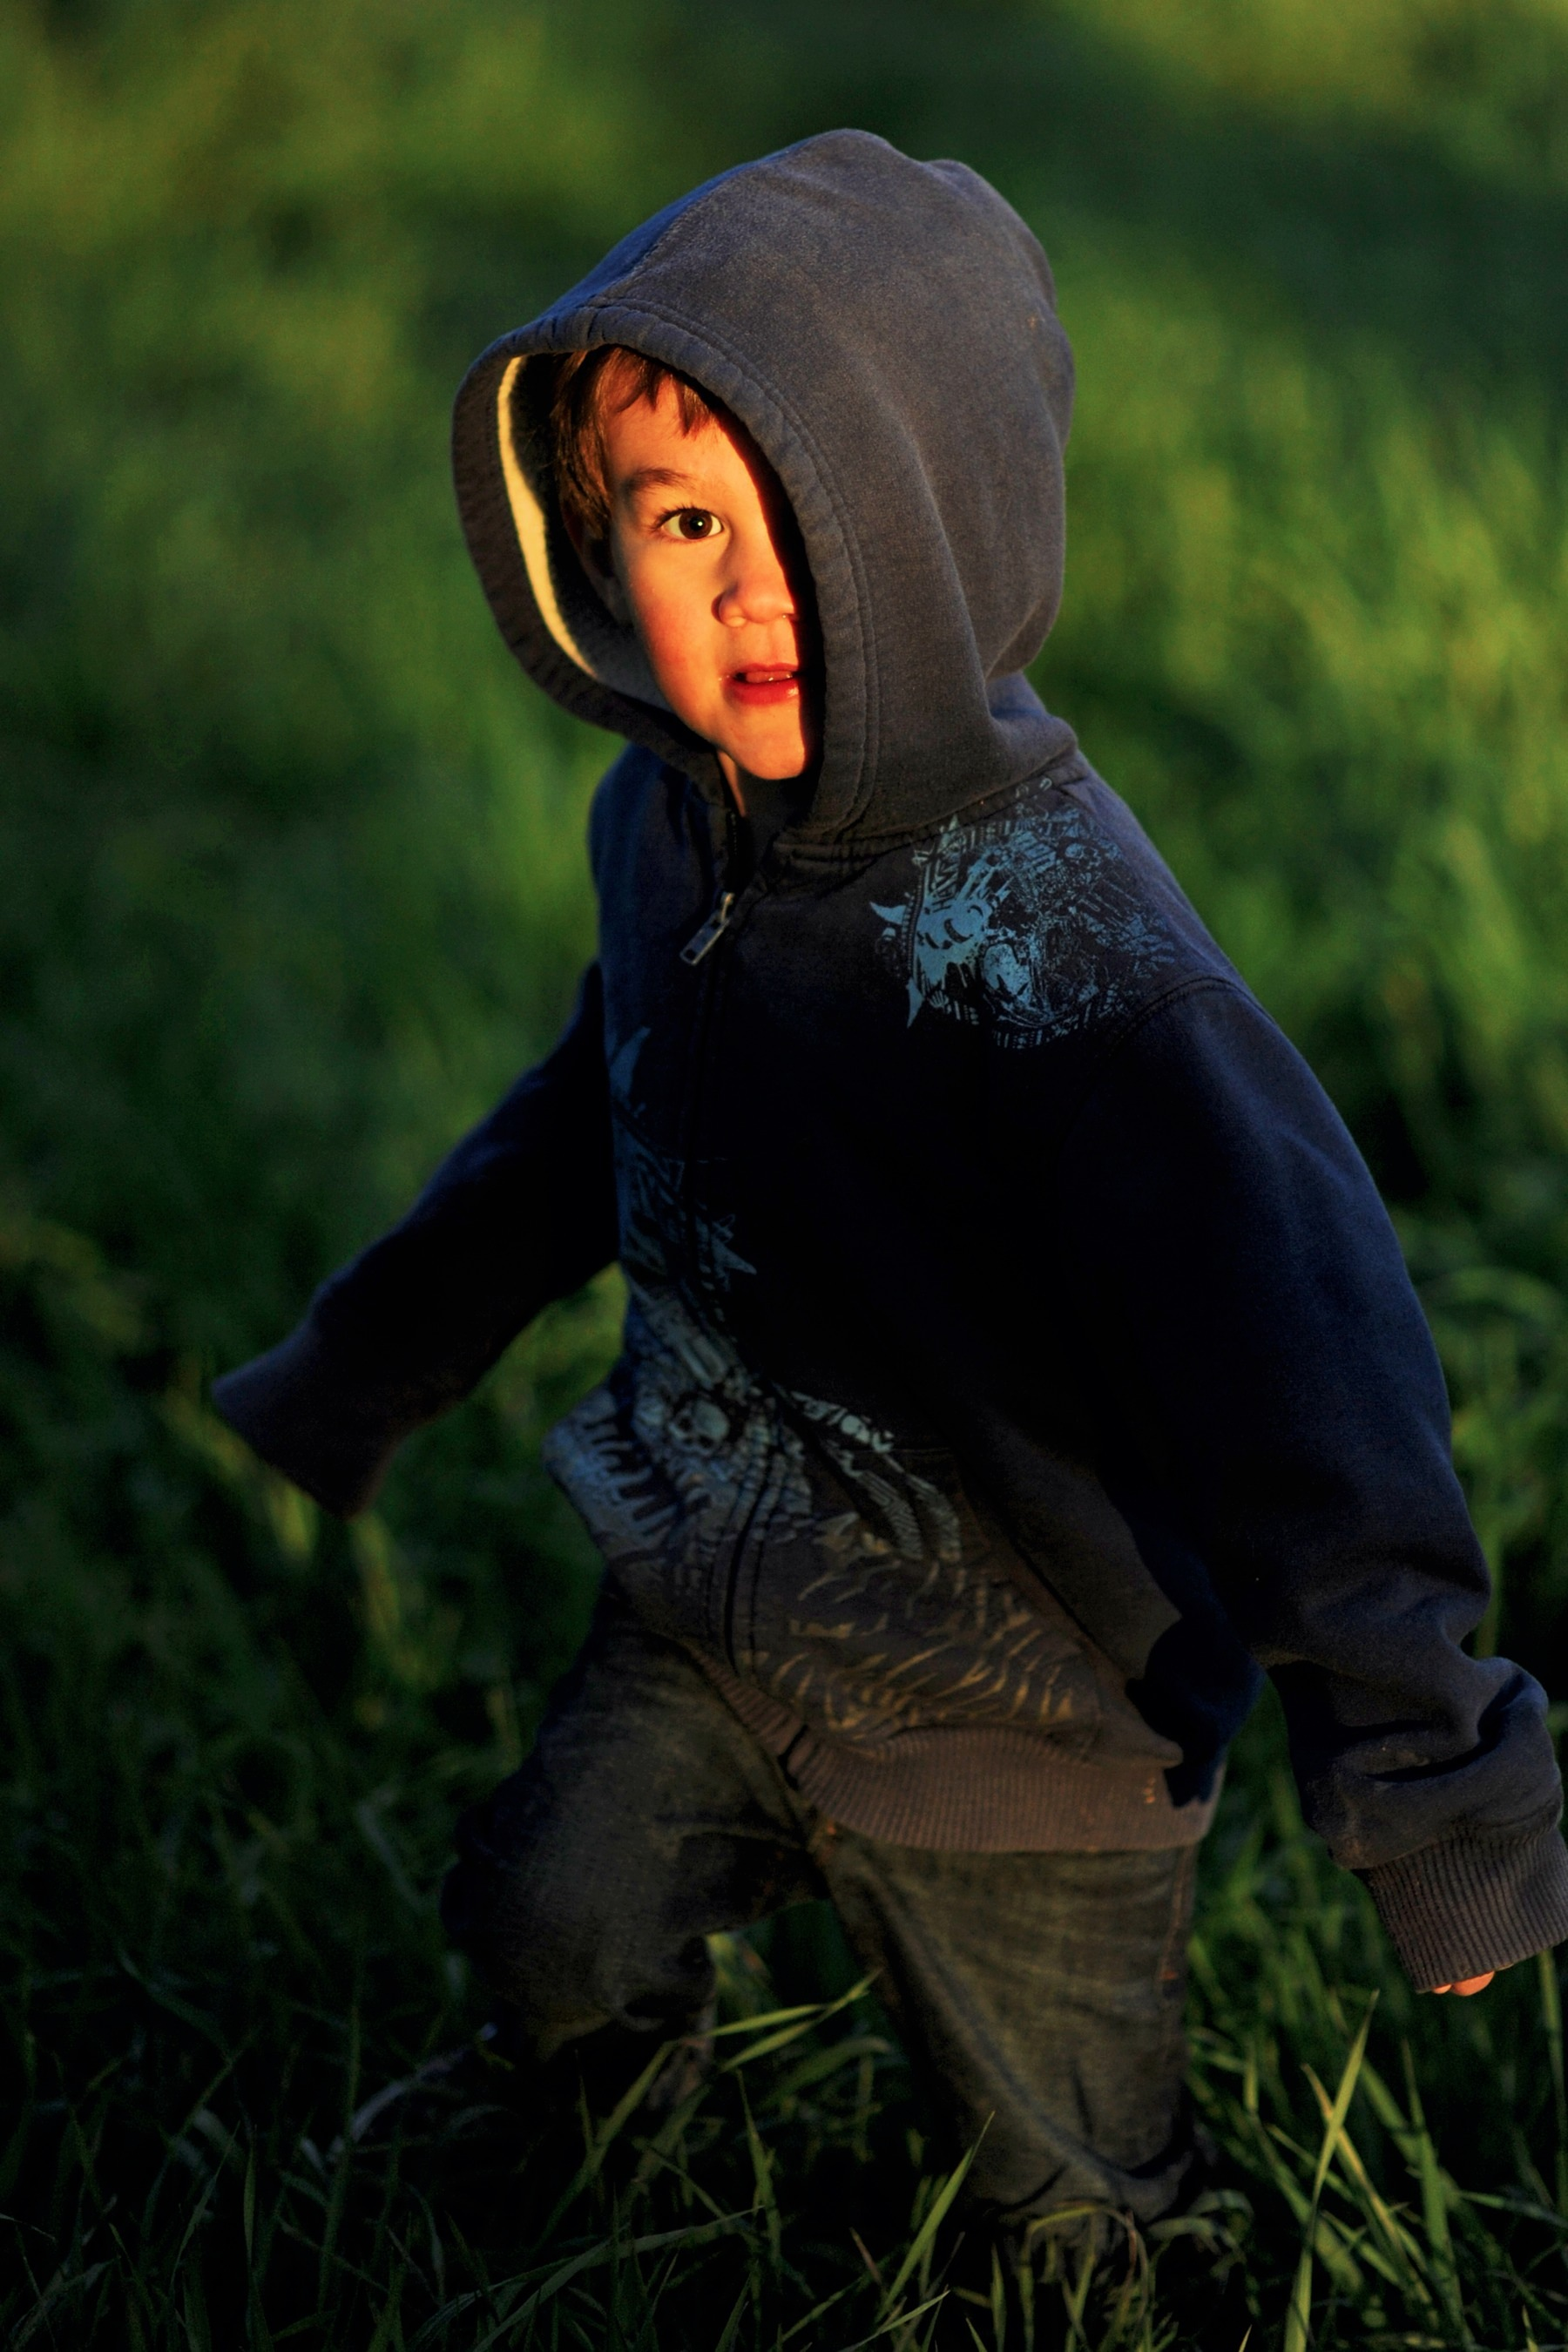 petaluma_portrait_photographer_san_francisco_portrait_photographer_napa_portrait_photographer061